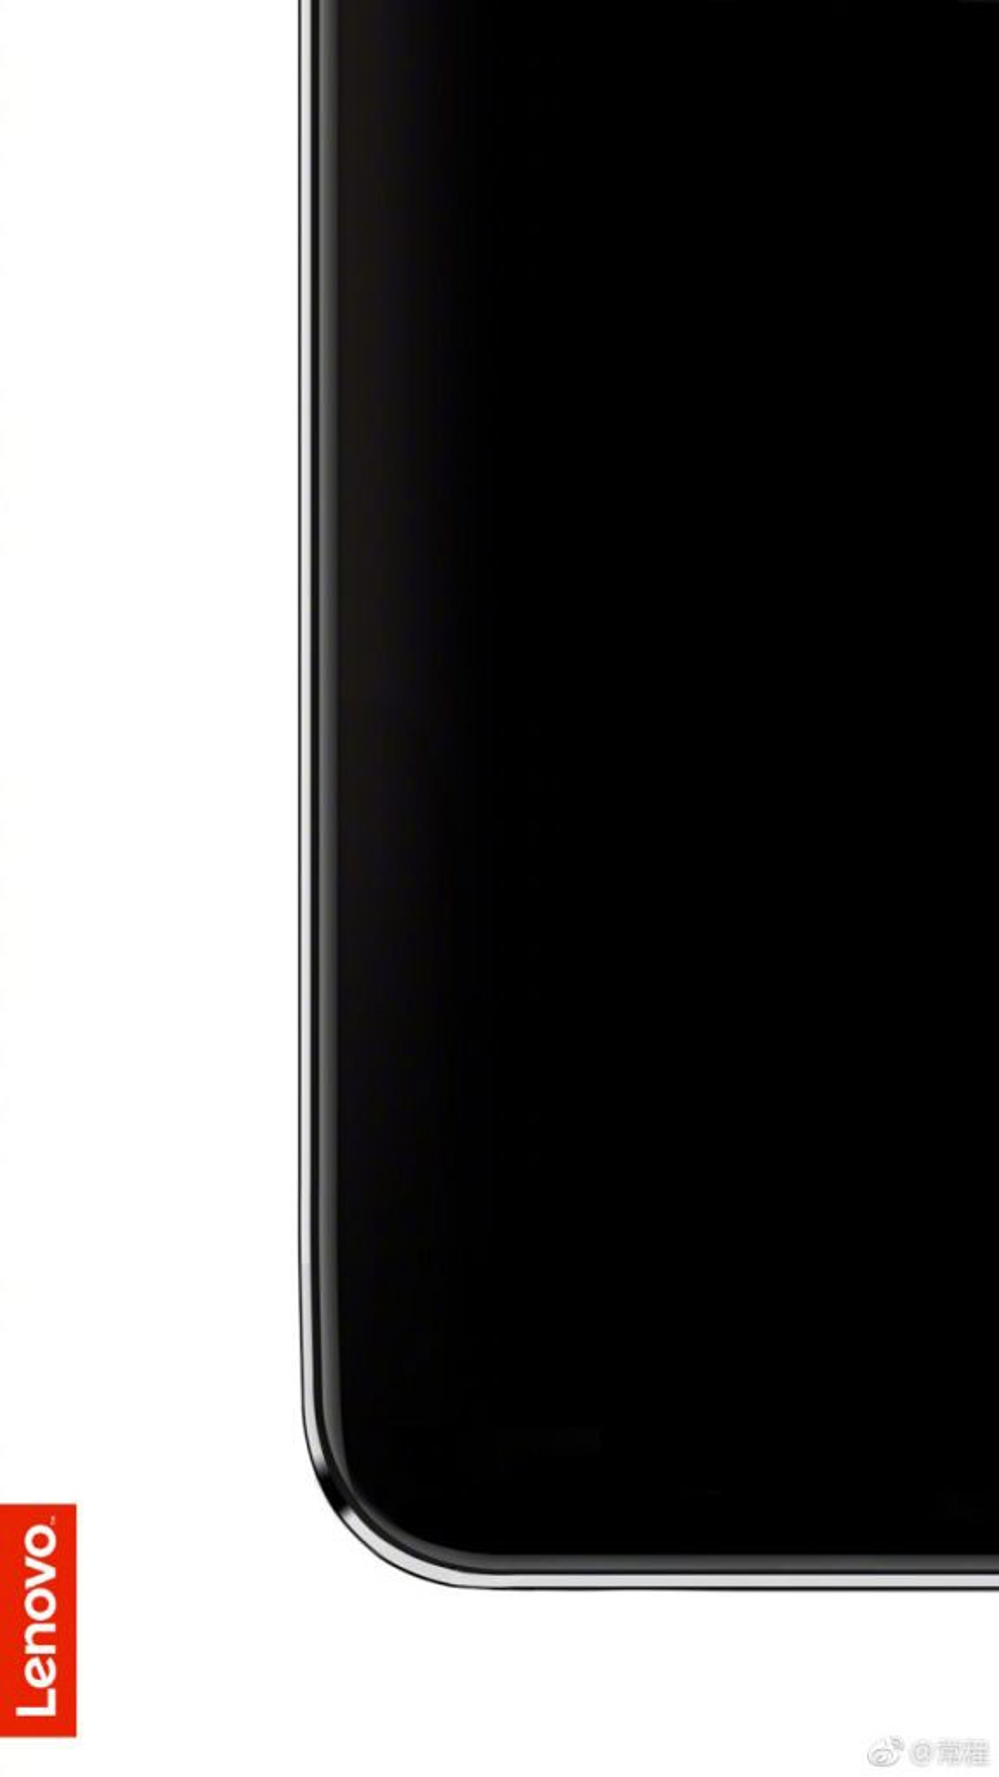 Lenovo Z5: Το δεύτερο teaser αποκαλύπτει μηδαμινά bezels στο κάτω μέρος της οθόνης